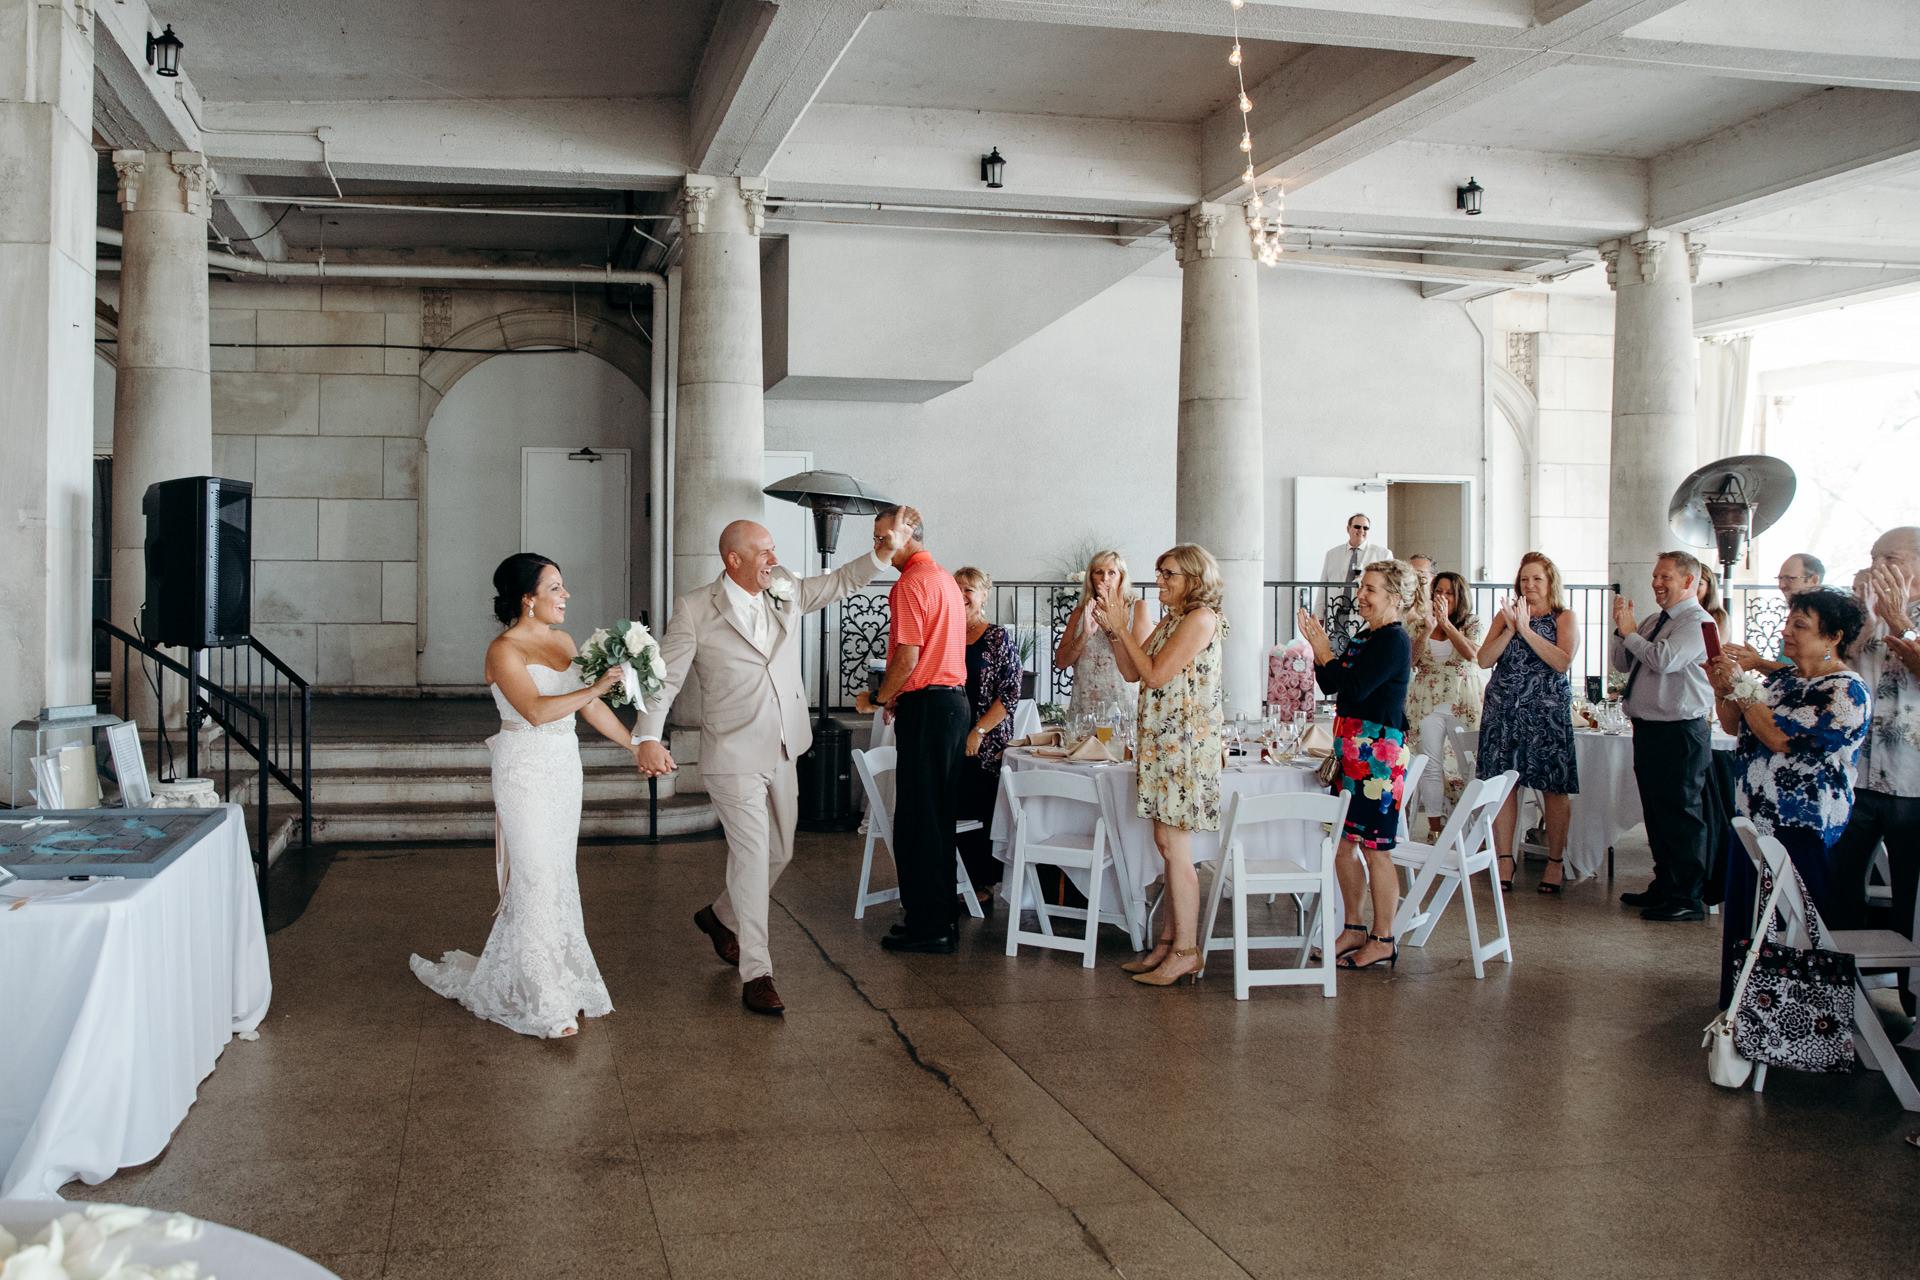 Grant Beachy Tammy Chris wedding photography goshen Saint Joseph veranda whitcomb-056.jpg